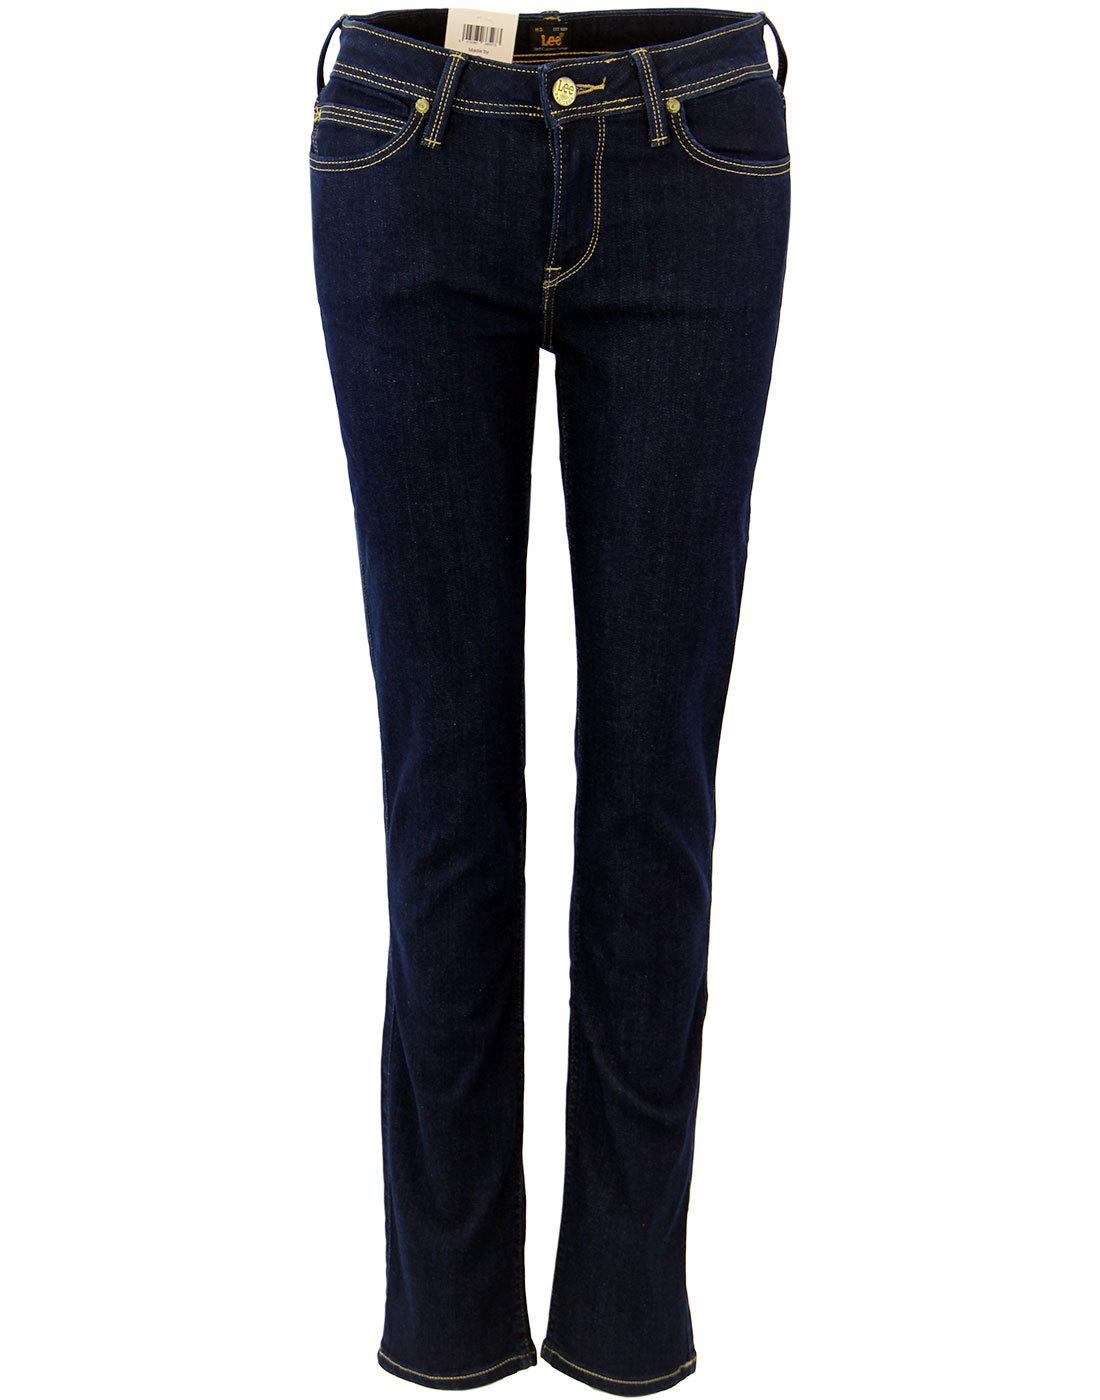 emlyn lee retro indie straight tapered fit denim jeans solid blue. Black Bedroom Furniture Sets. Home Design Ideas